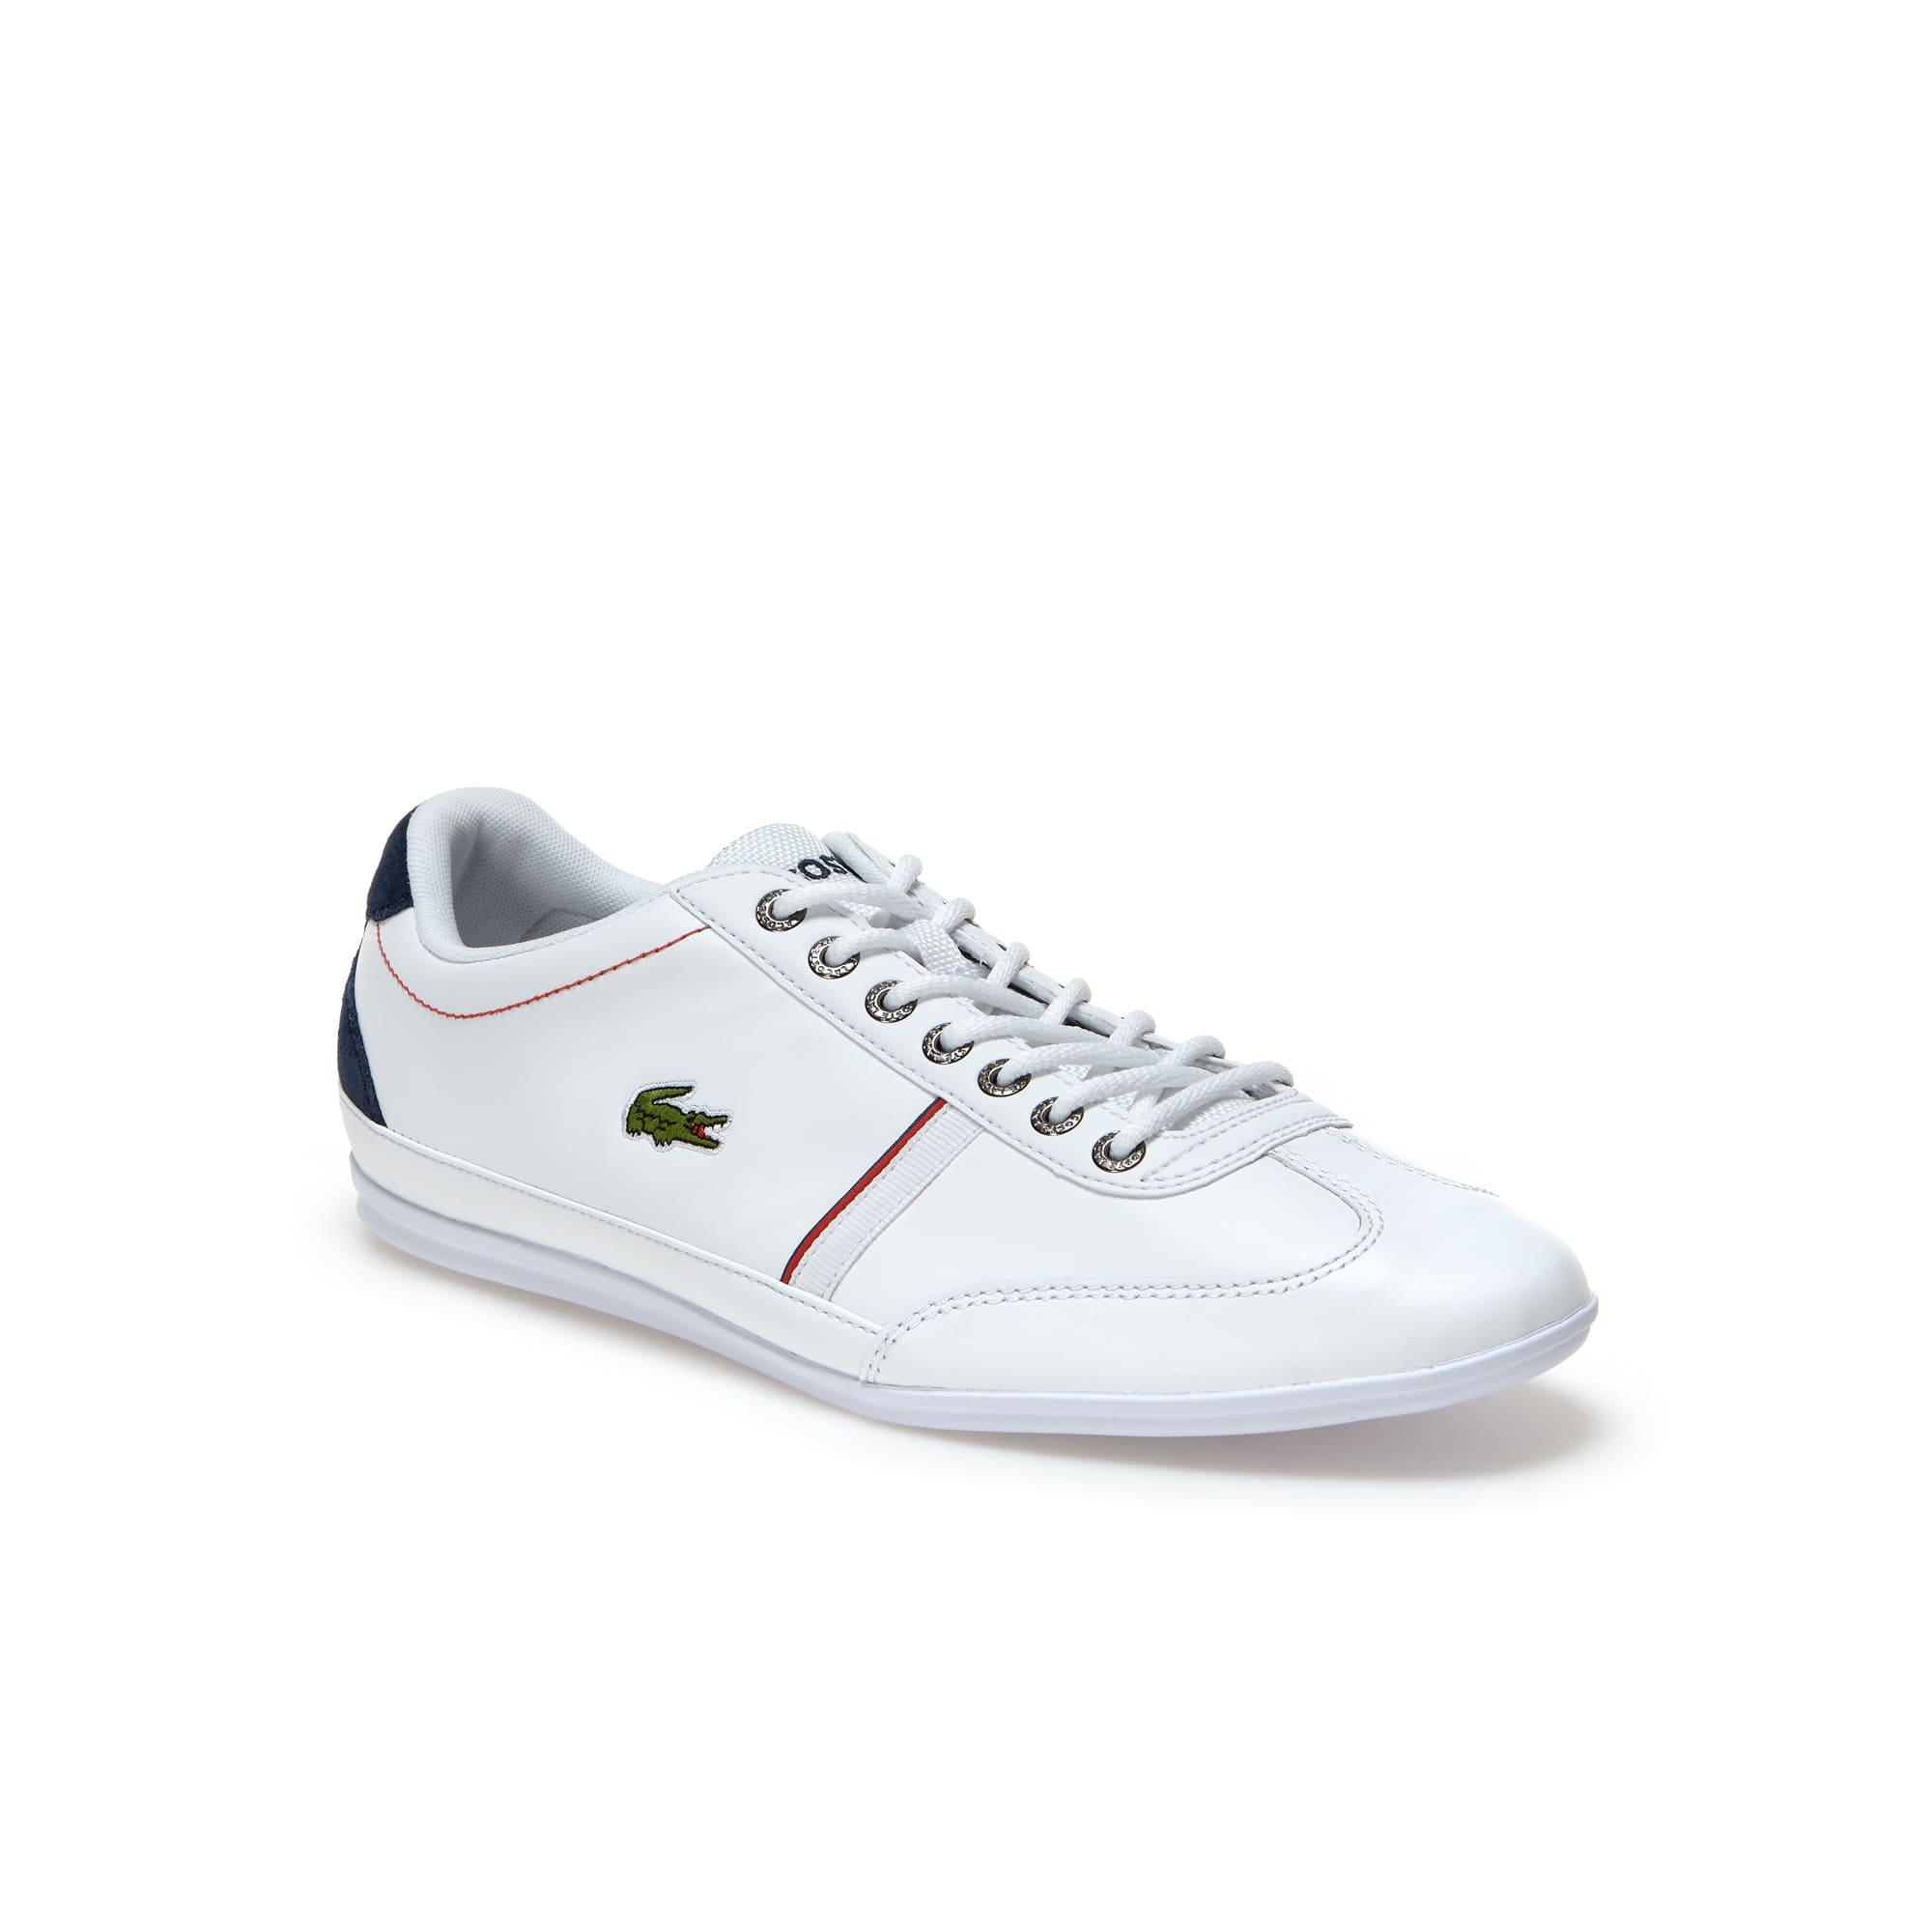 Zapatillas Misano Sport 118 1